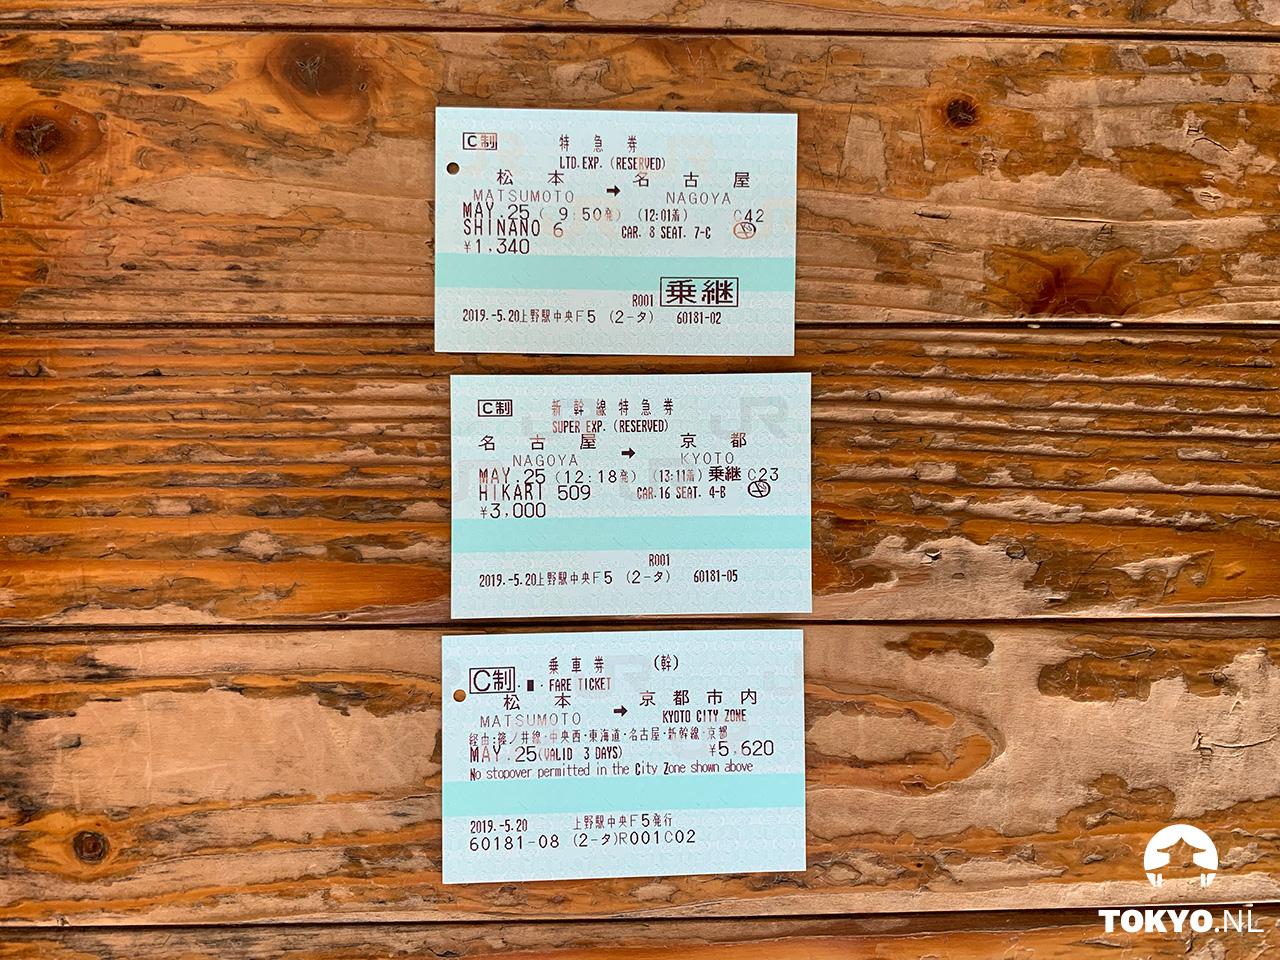 Treinkaartjes Matsumoto - Nagoya - Kyoto